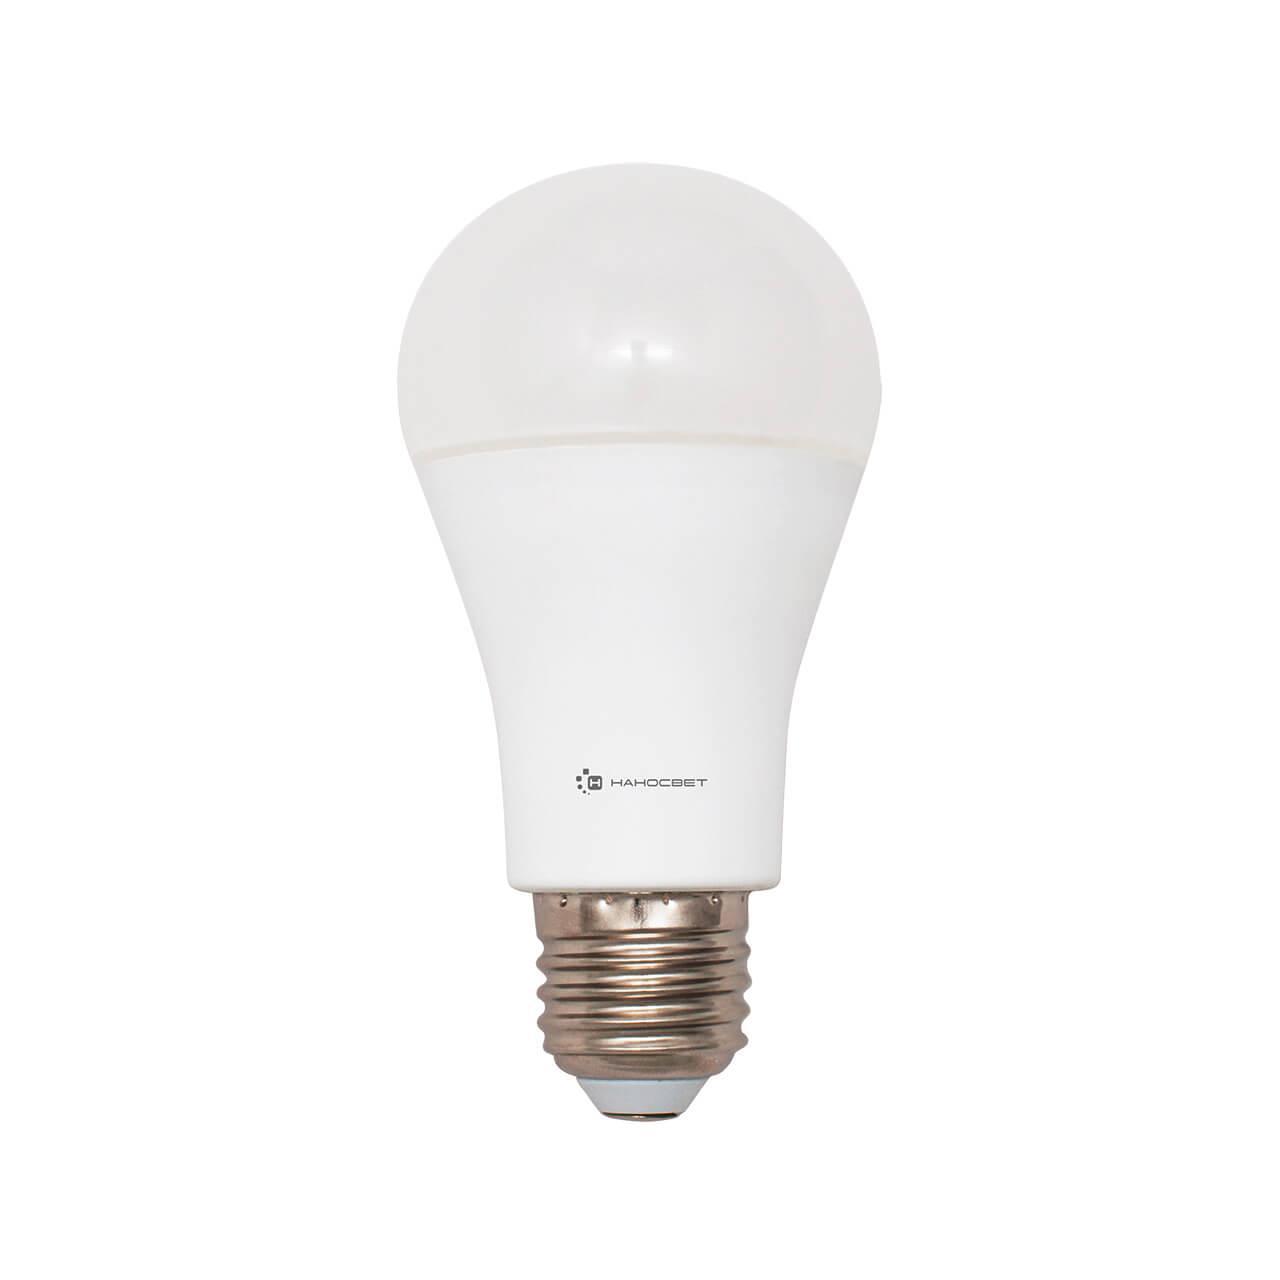 Лампа светодиодная Наносвет E27 18W 4000K груша матовая LC-GLS-18/E27/840 L199